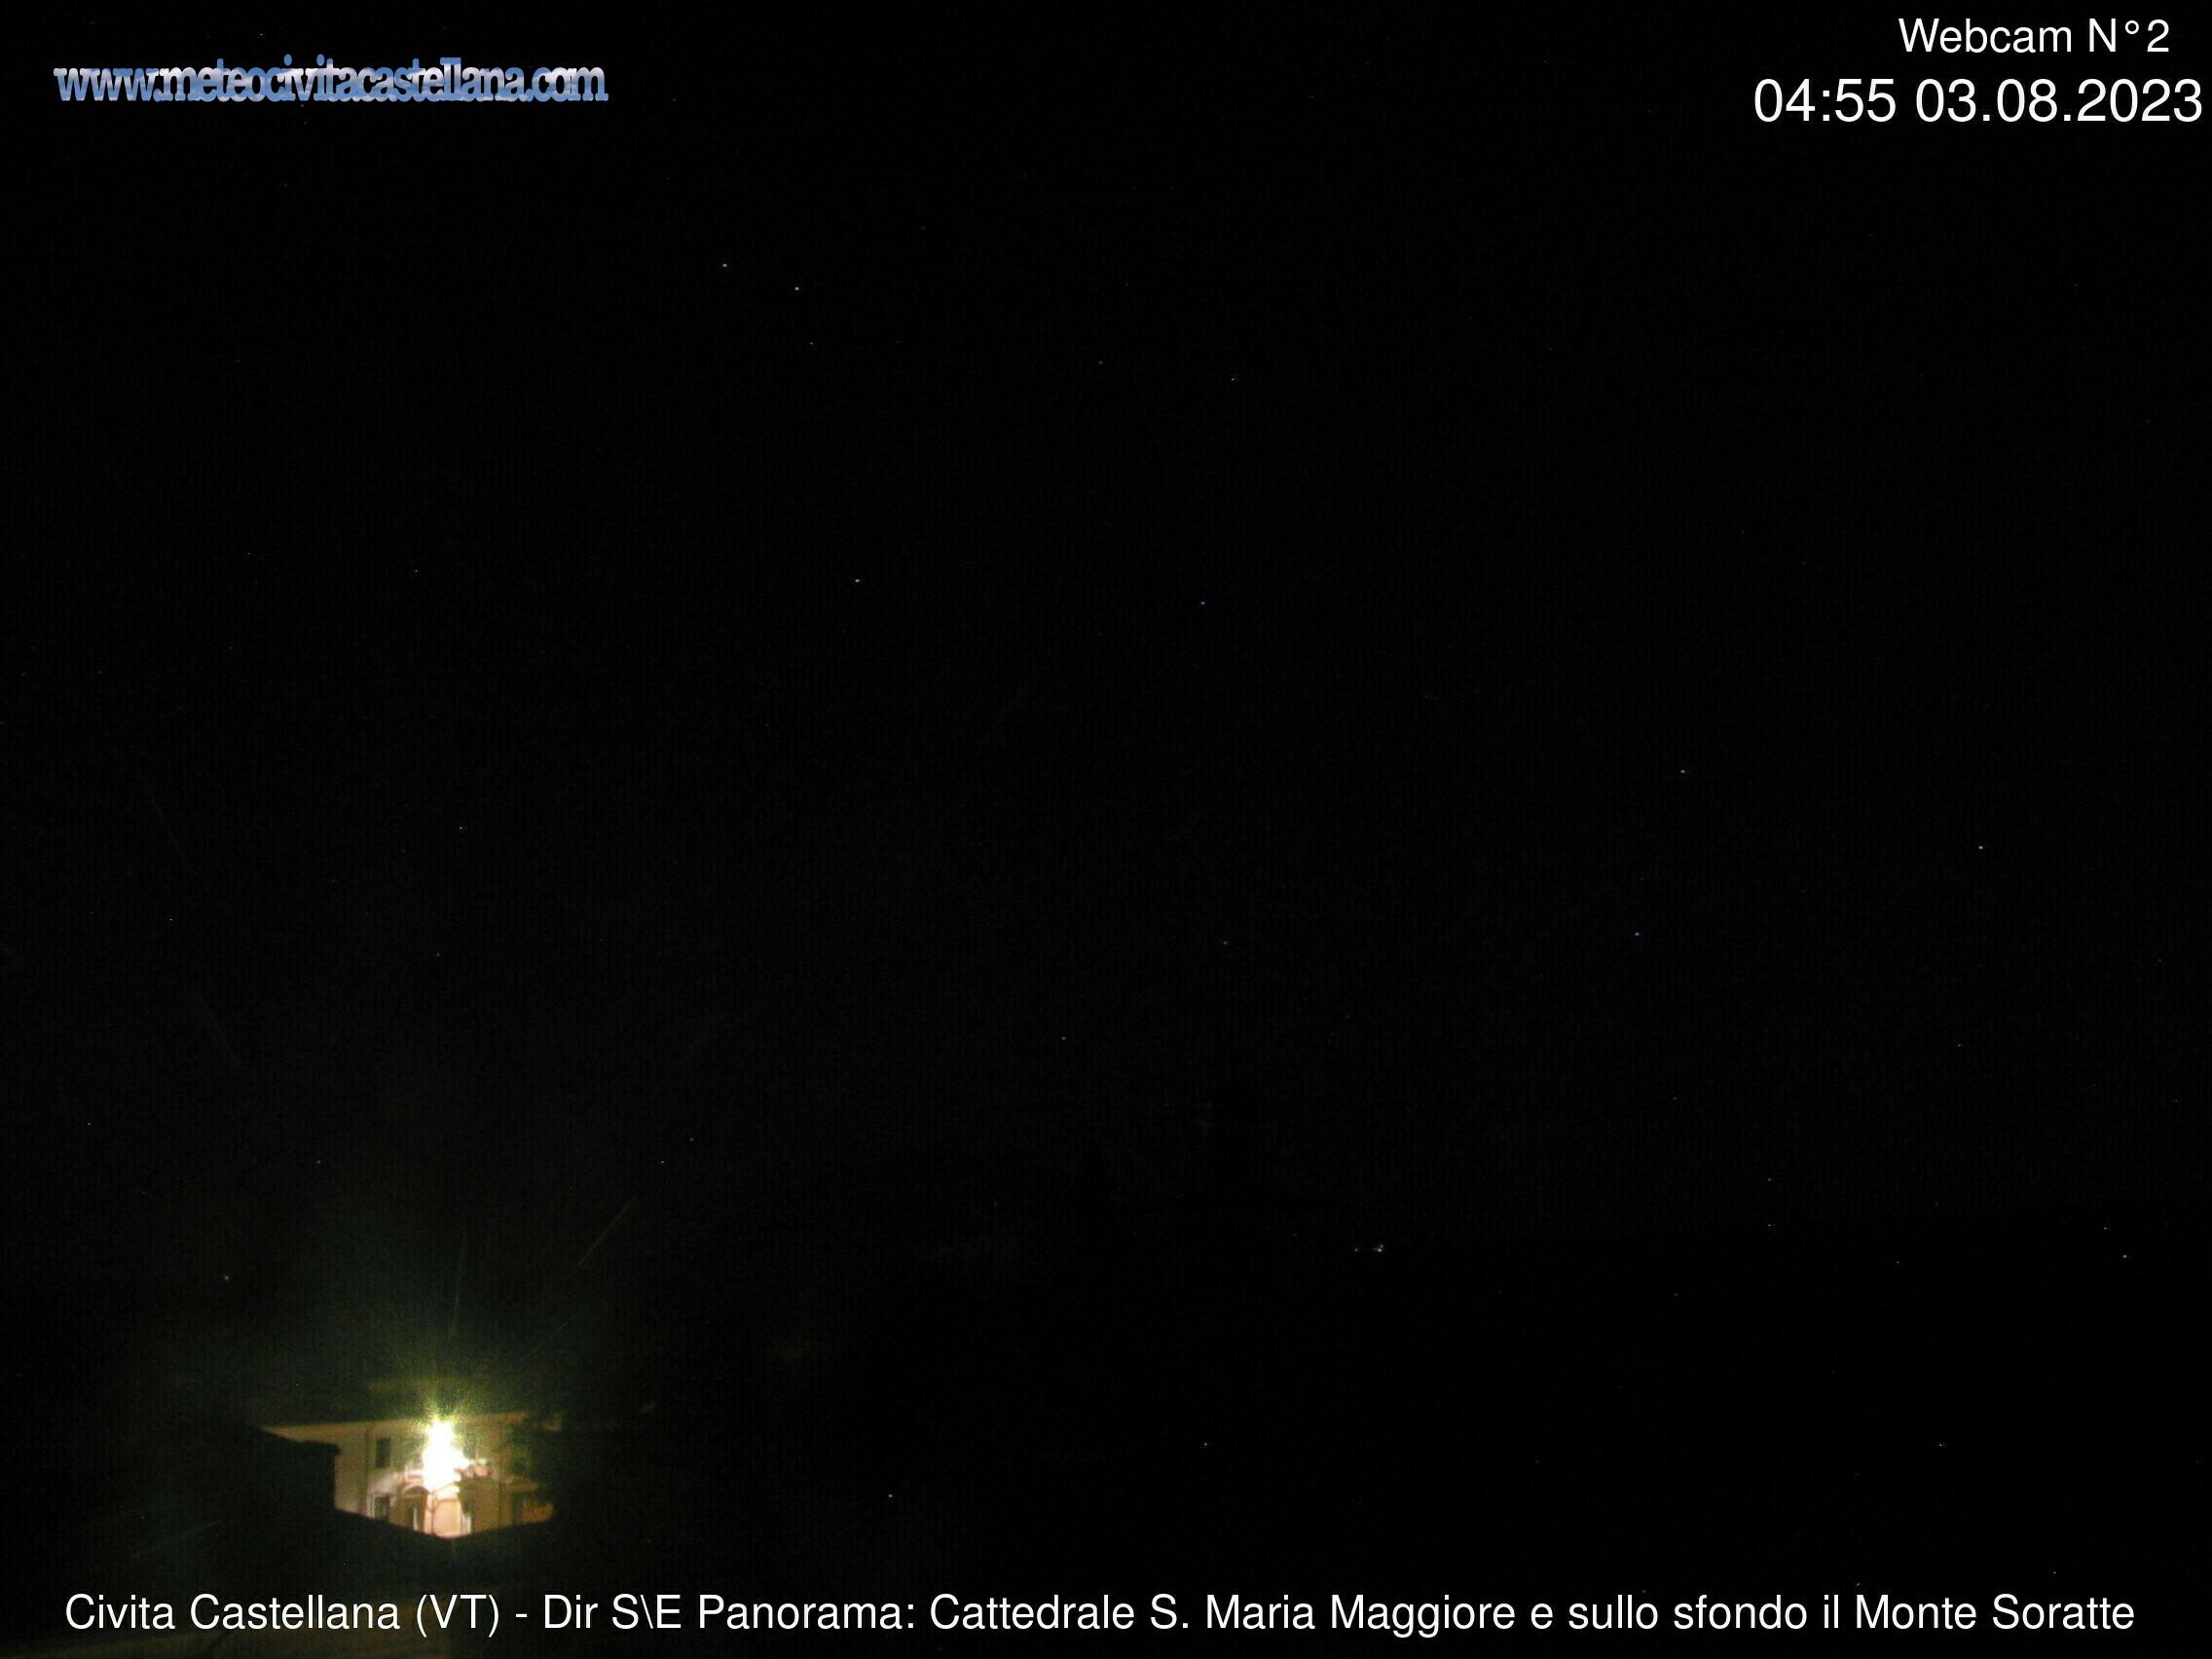 Civita Castellana Fri. 04:58